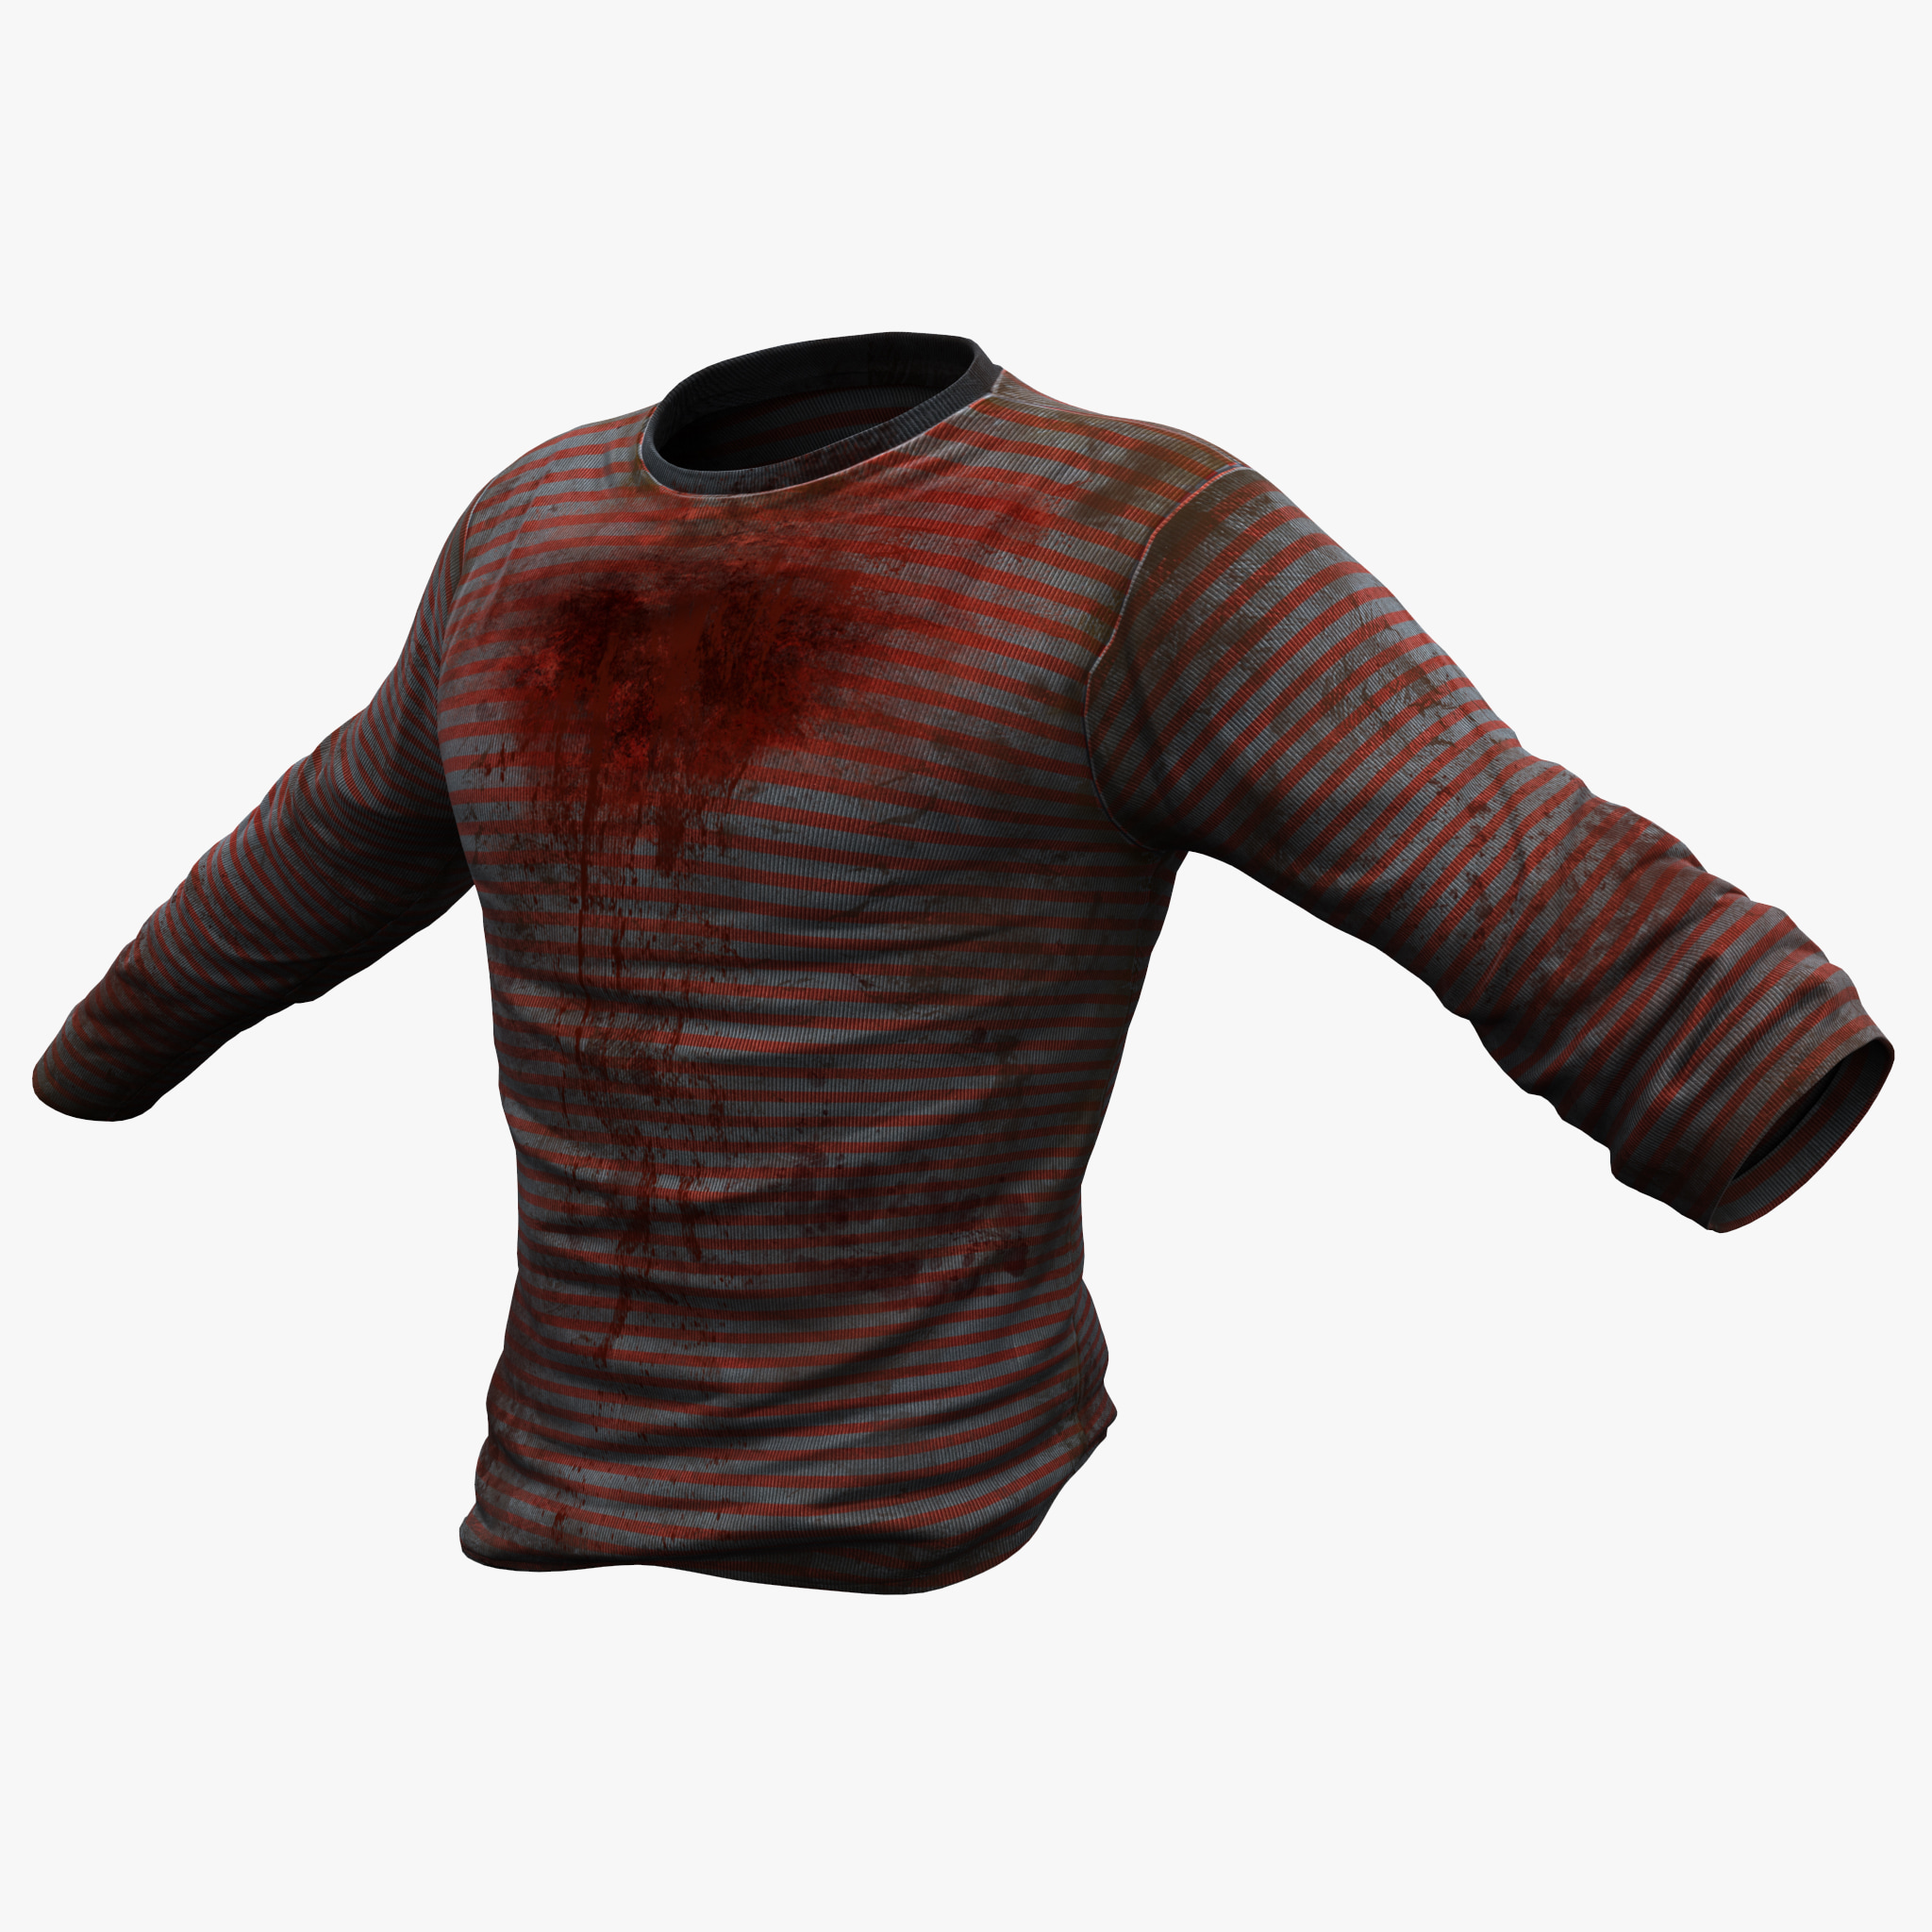 270028_Blood_Sweater_000.jpg